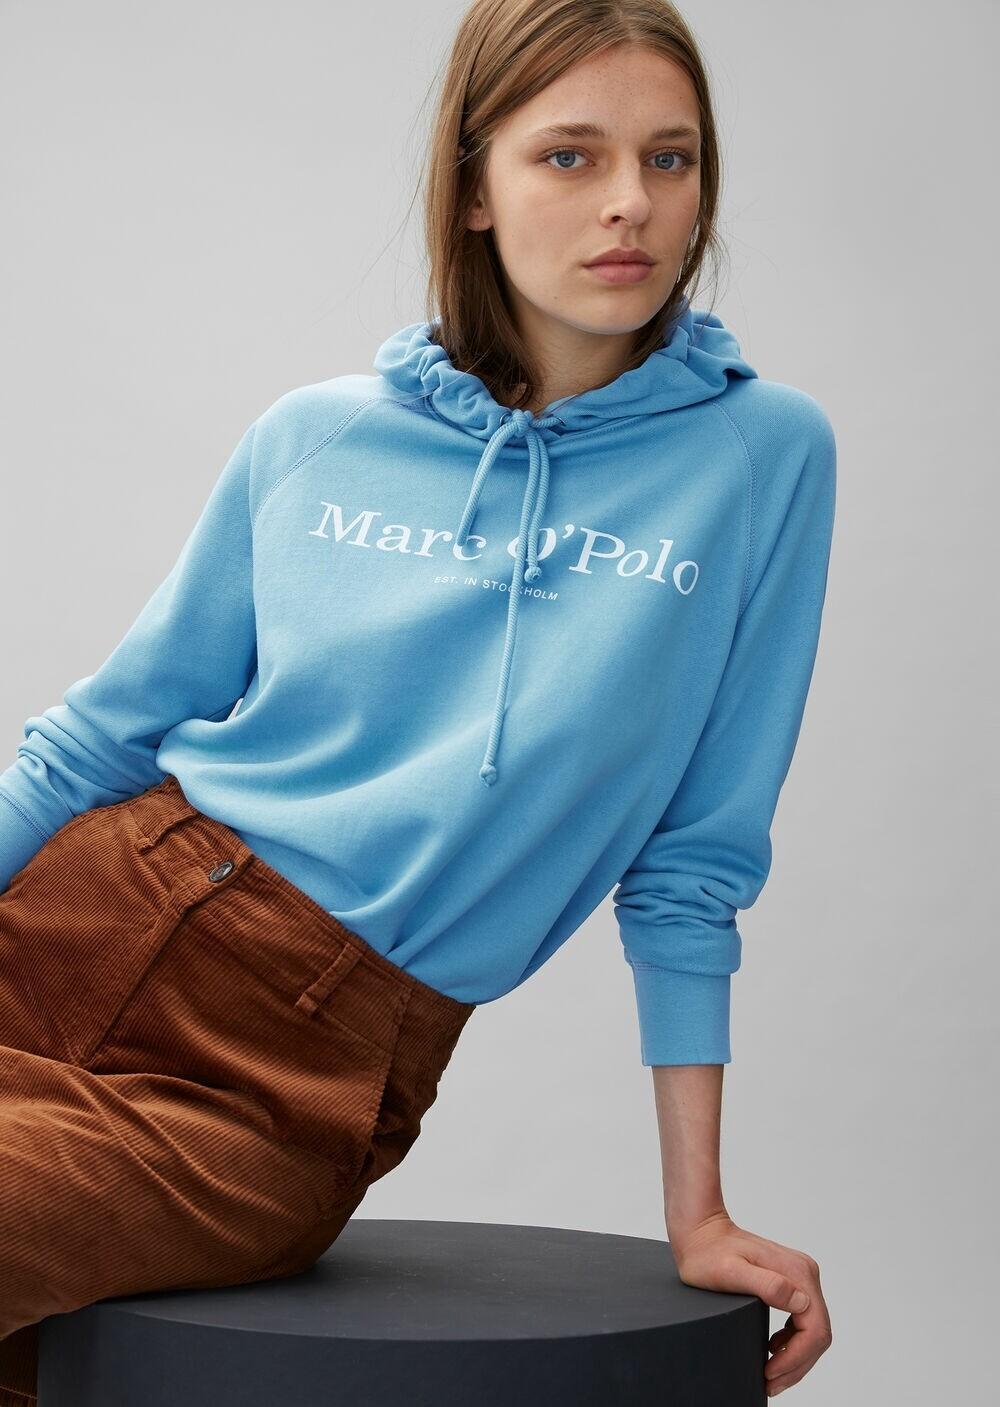 Baby Blue Hooded Sweatshirt